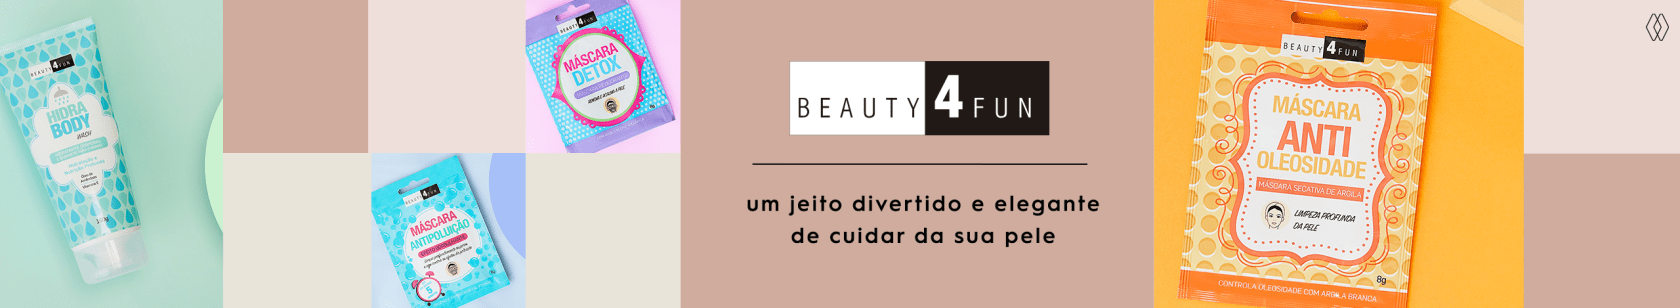 BEAUTY 4 FUN | AMARO